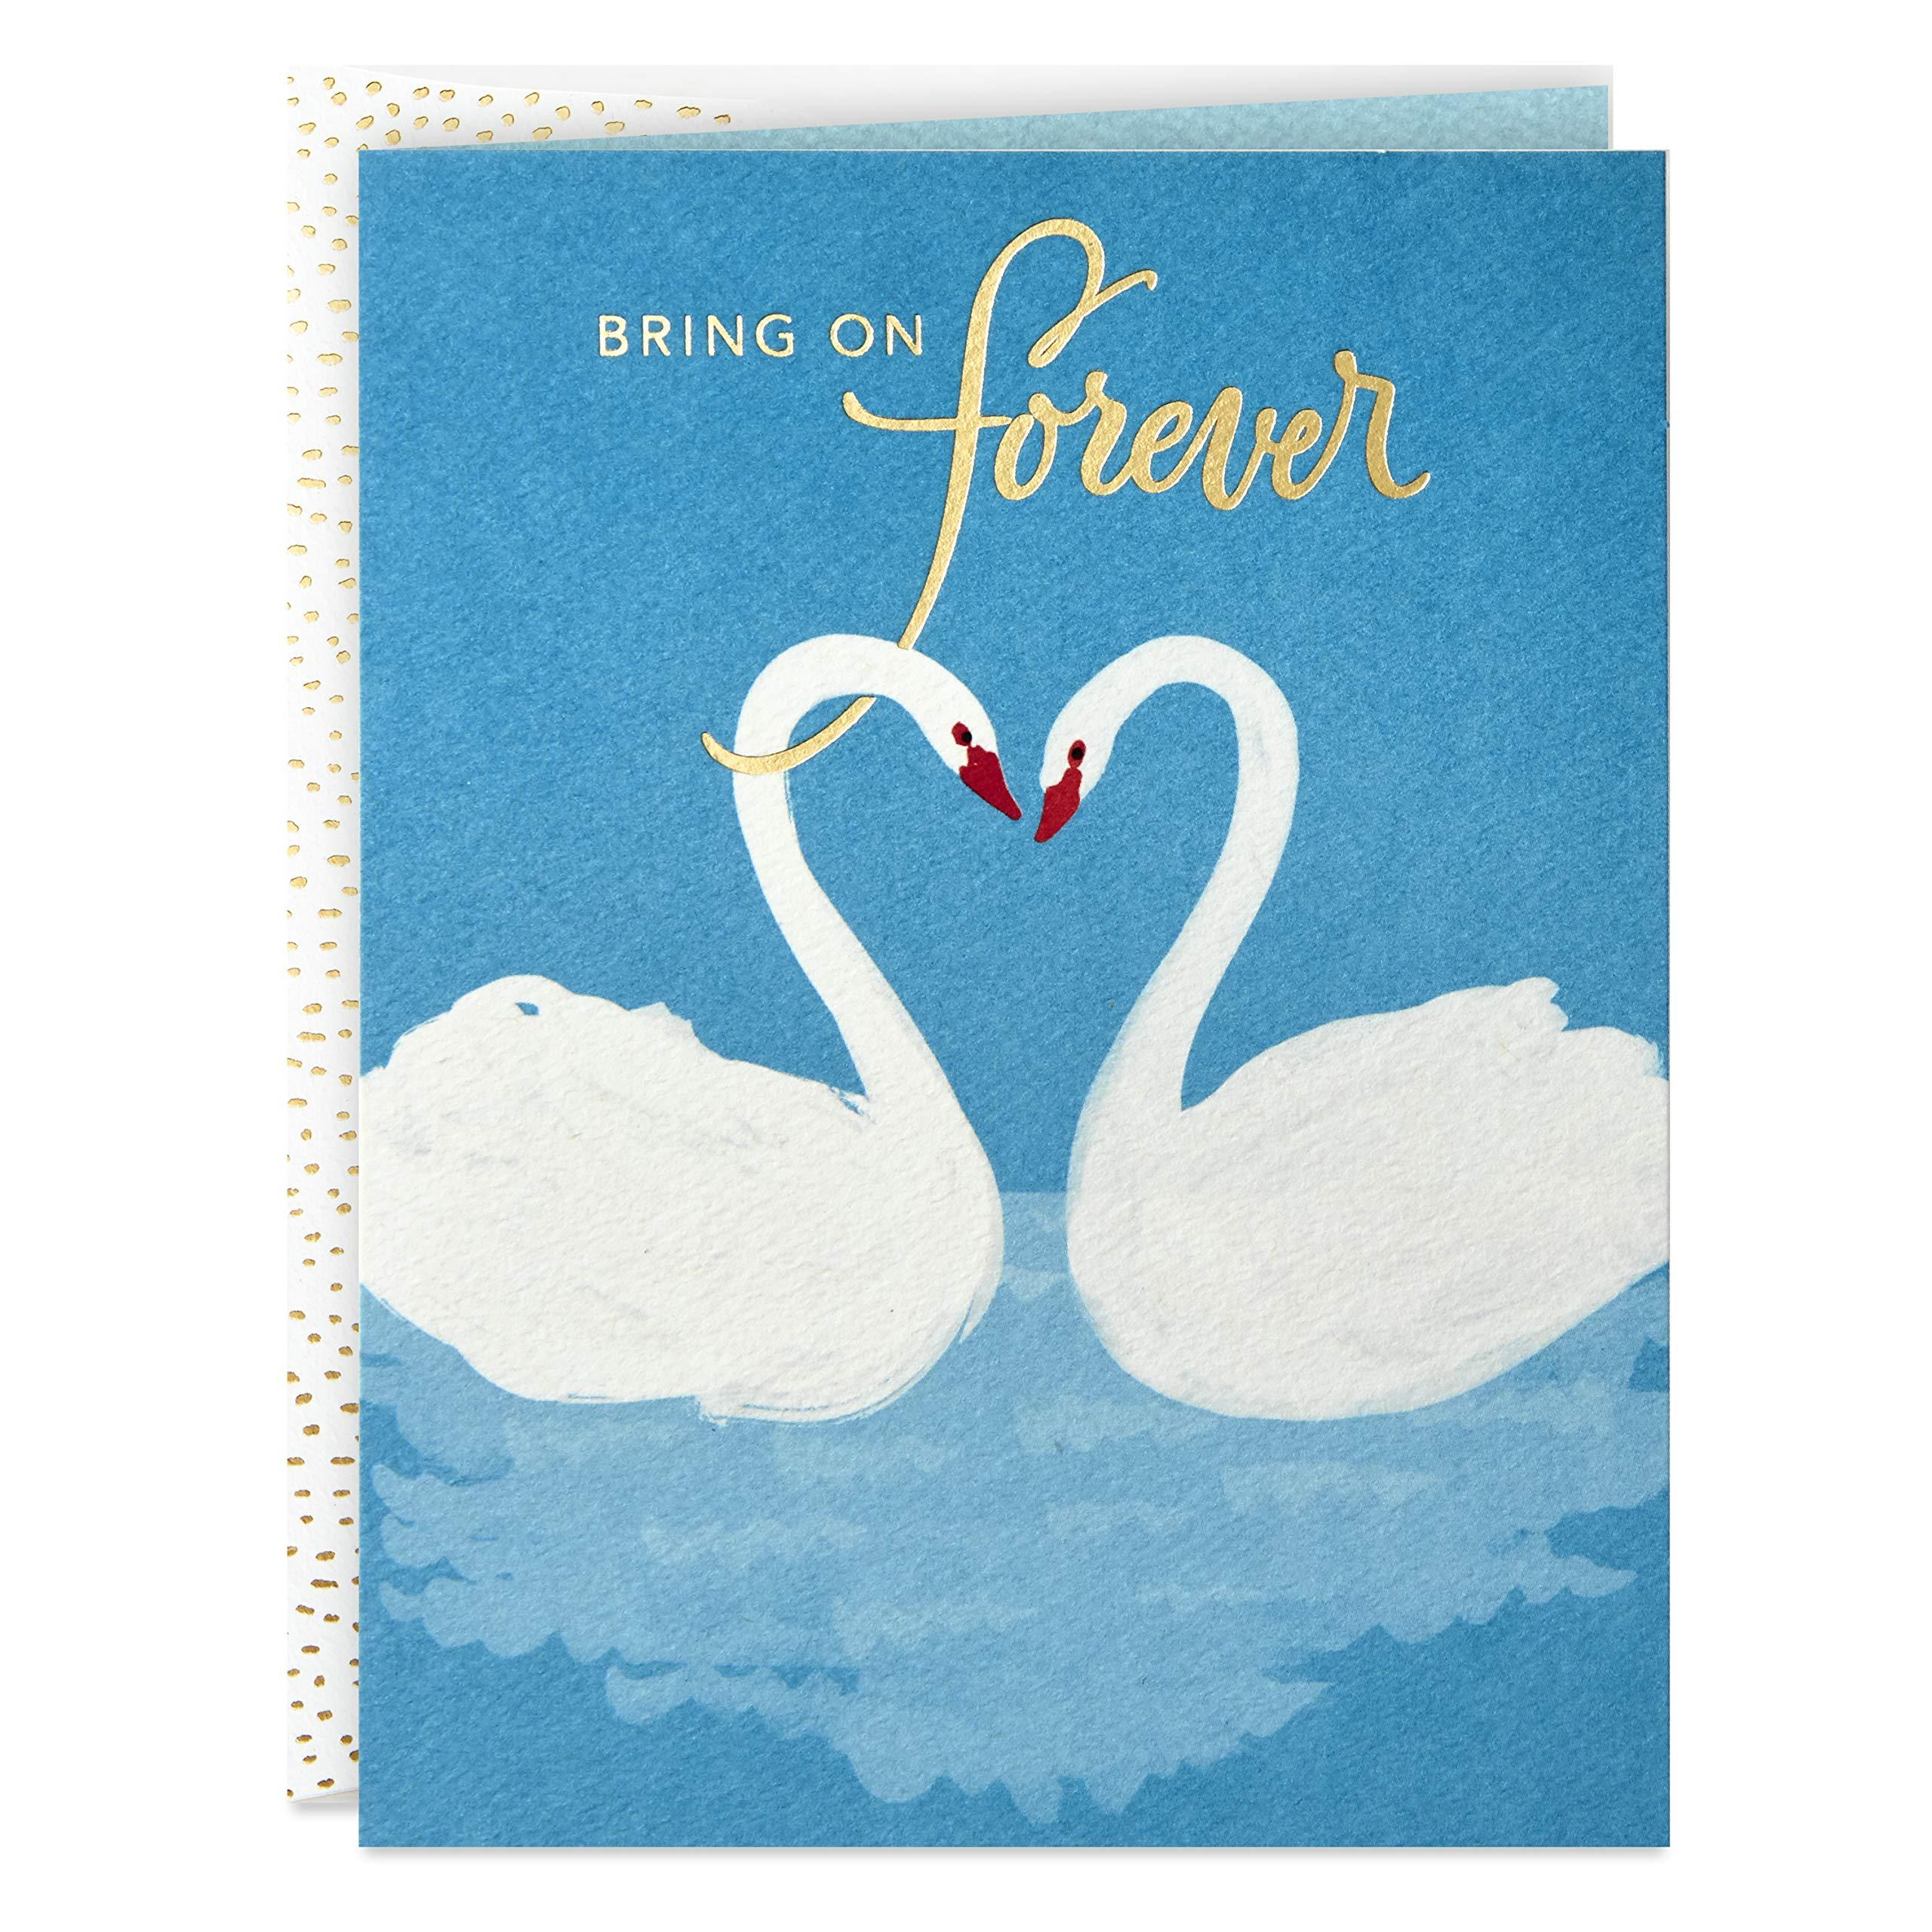 Hallmark Good Mail 婚礼卡,新娘淋浴卡,订婚卡(瑞士)